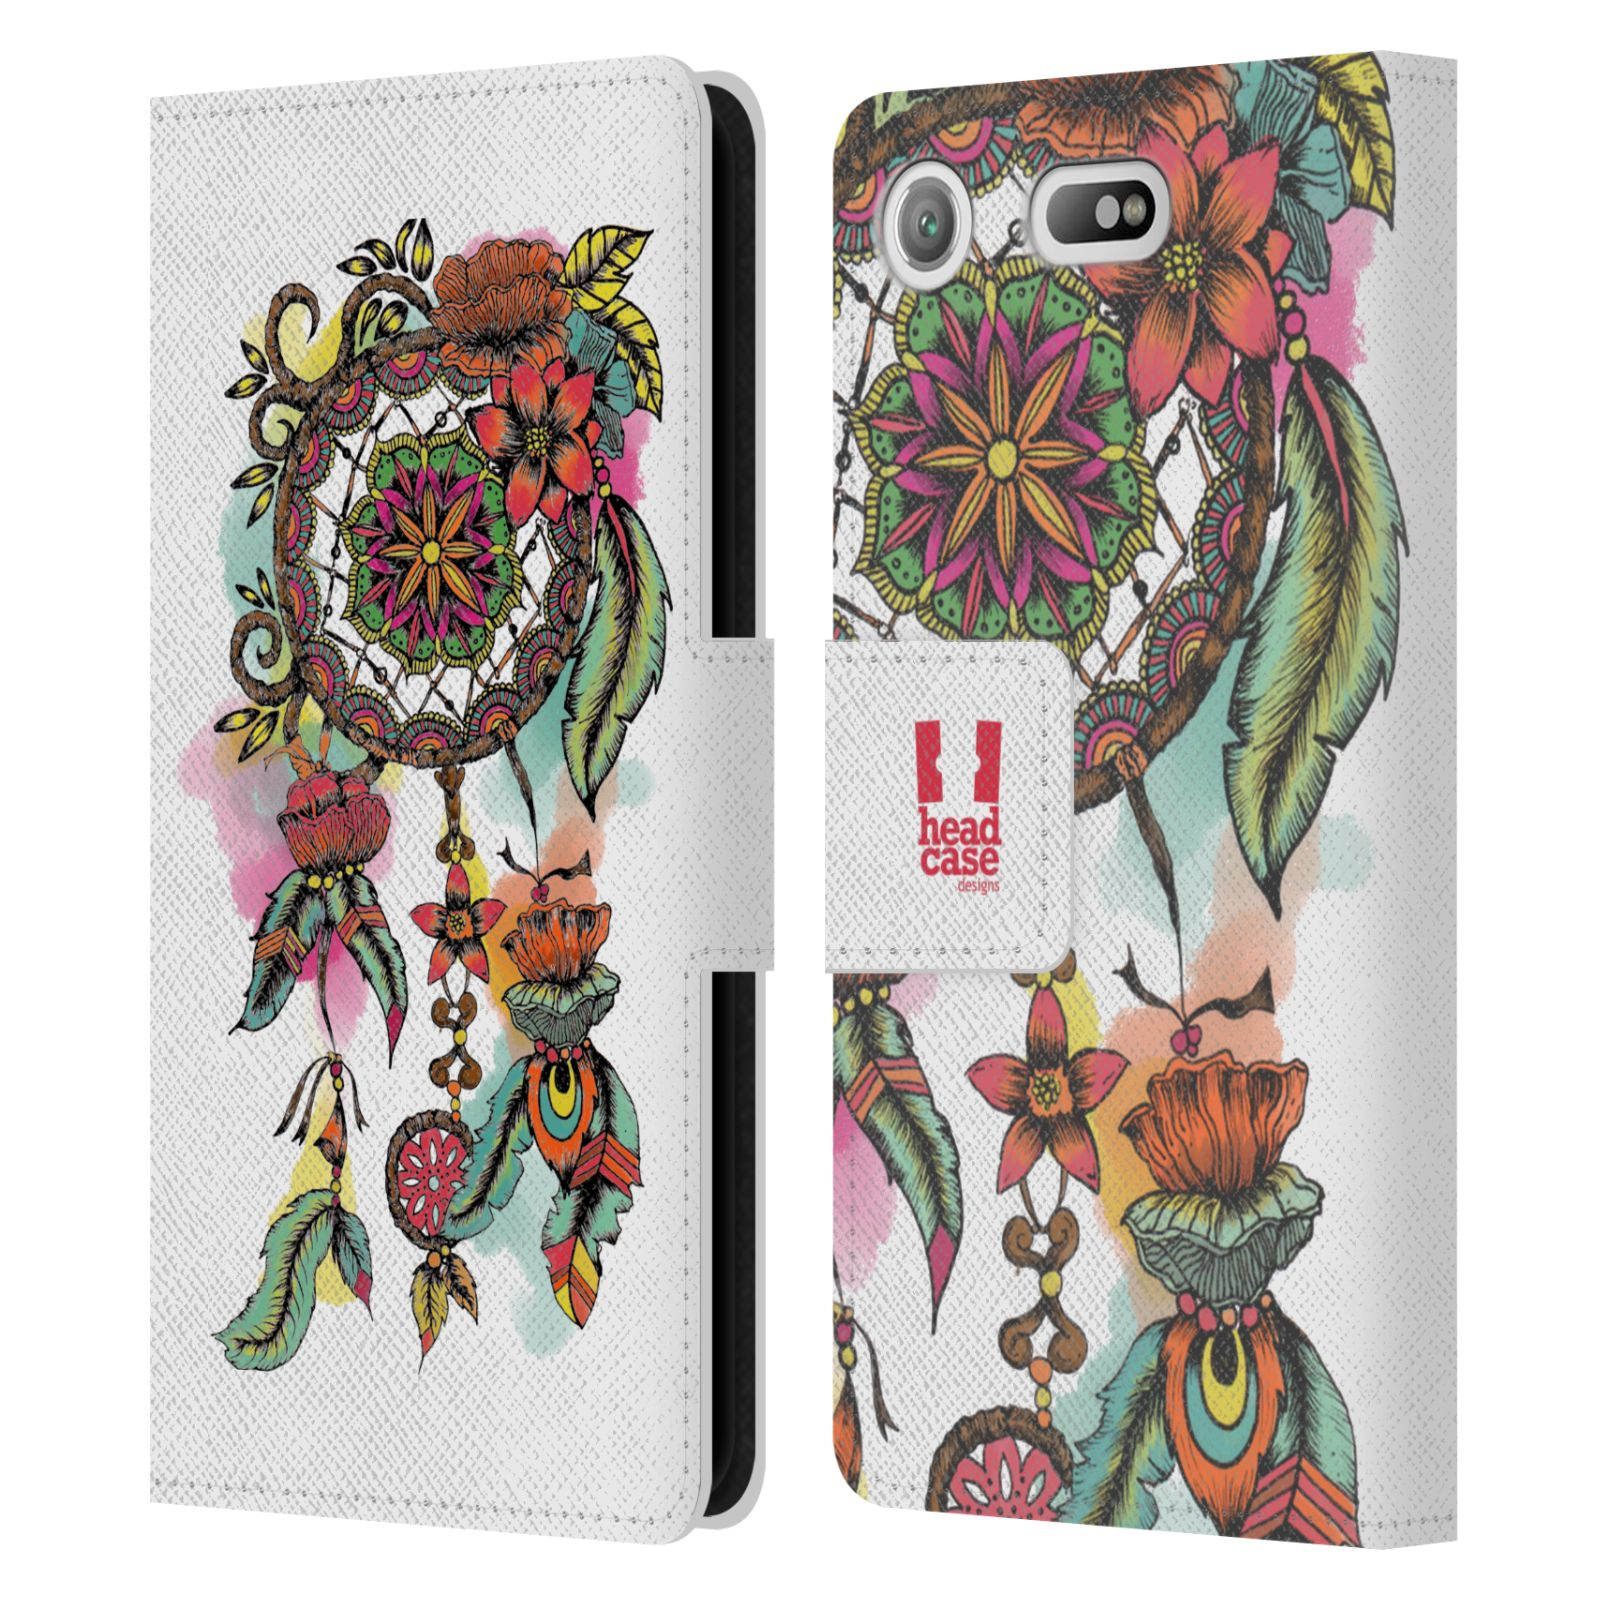 Pouzdro na mobil Sony Xperia XZ1 Compact - Head Case - Lapač snů květy červená